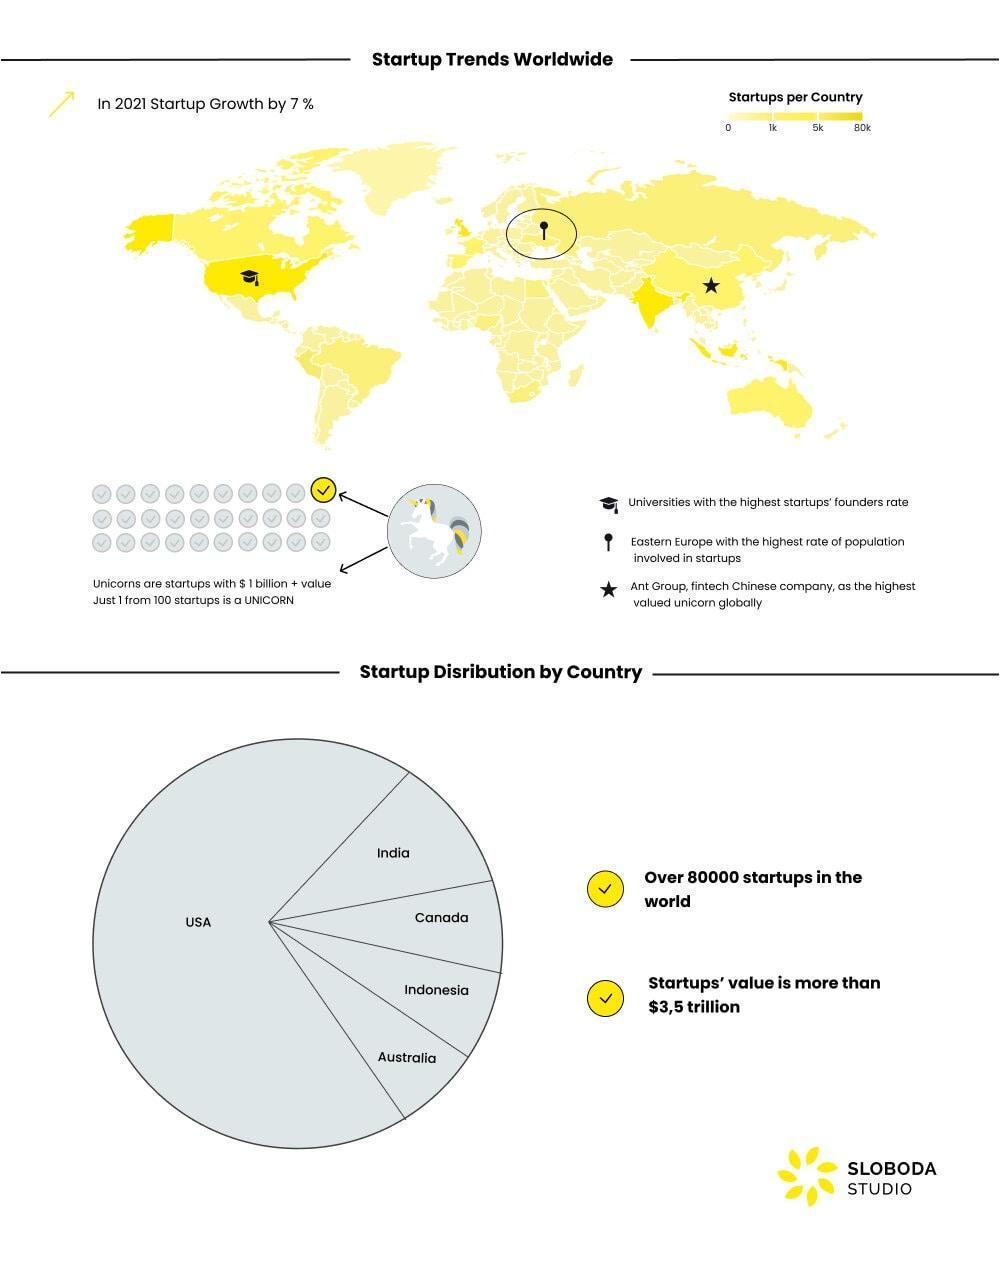 startup trends worldwide in 2021